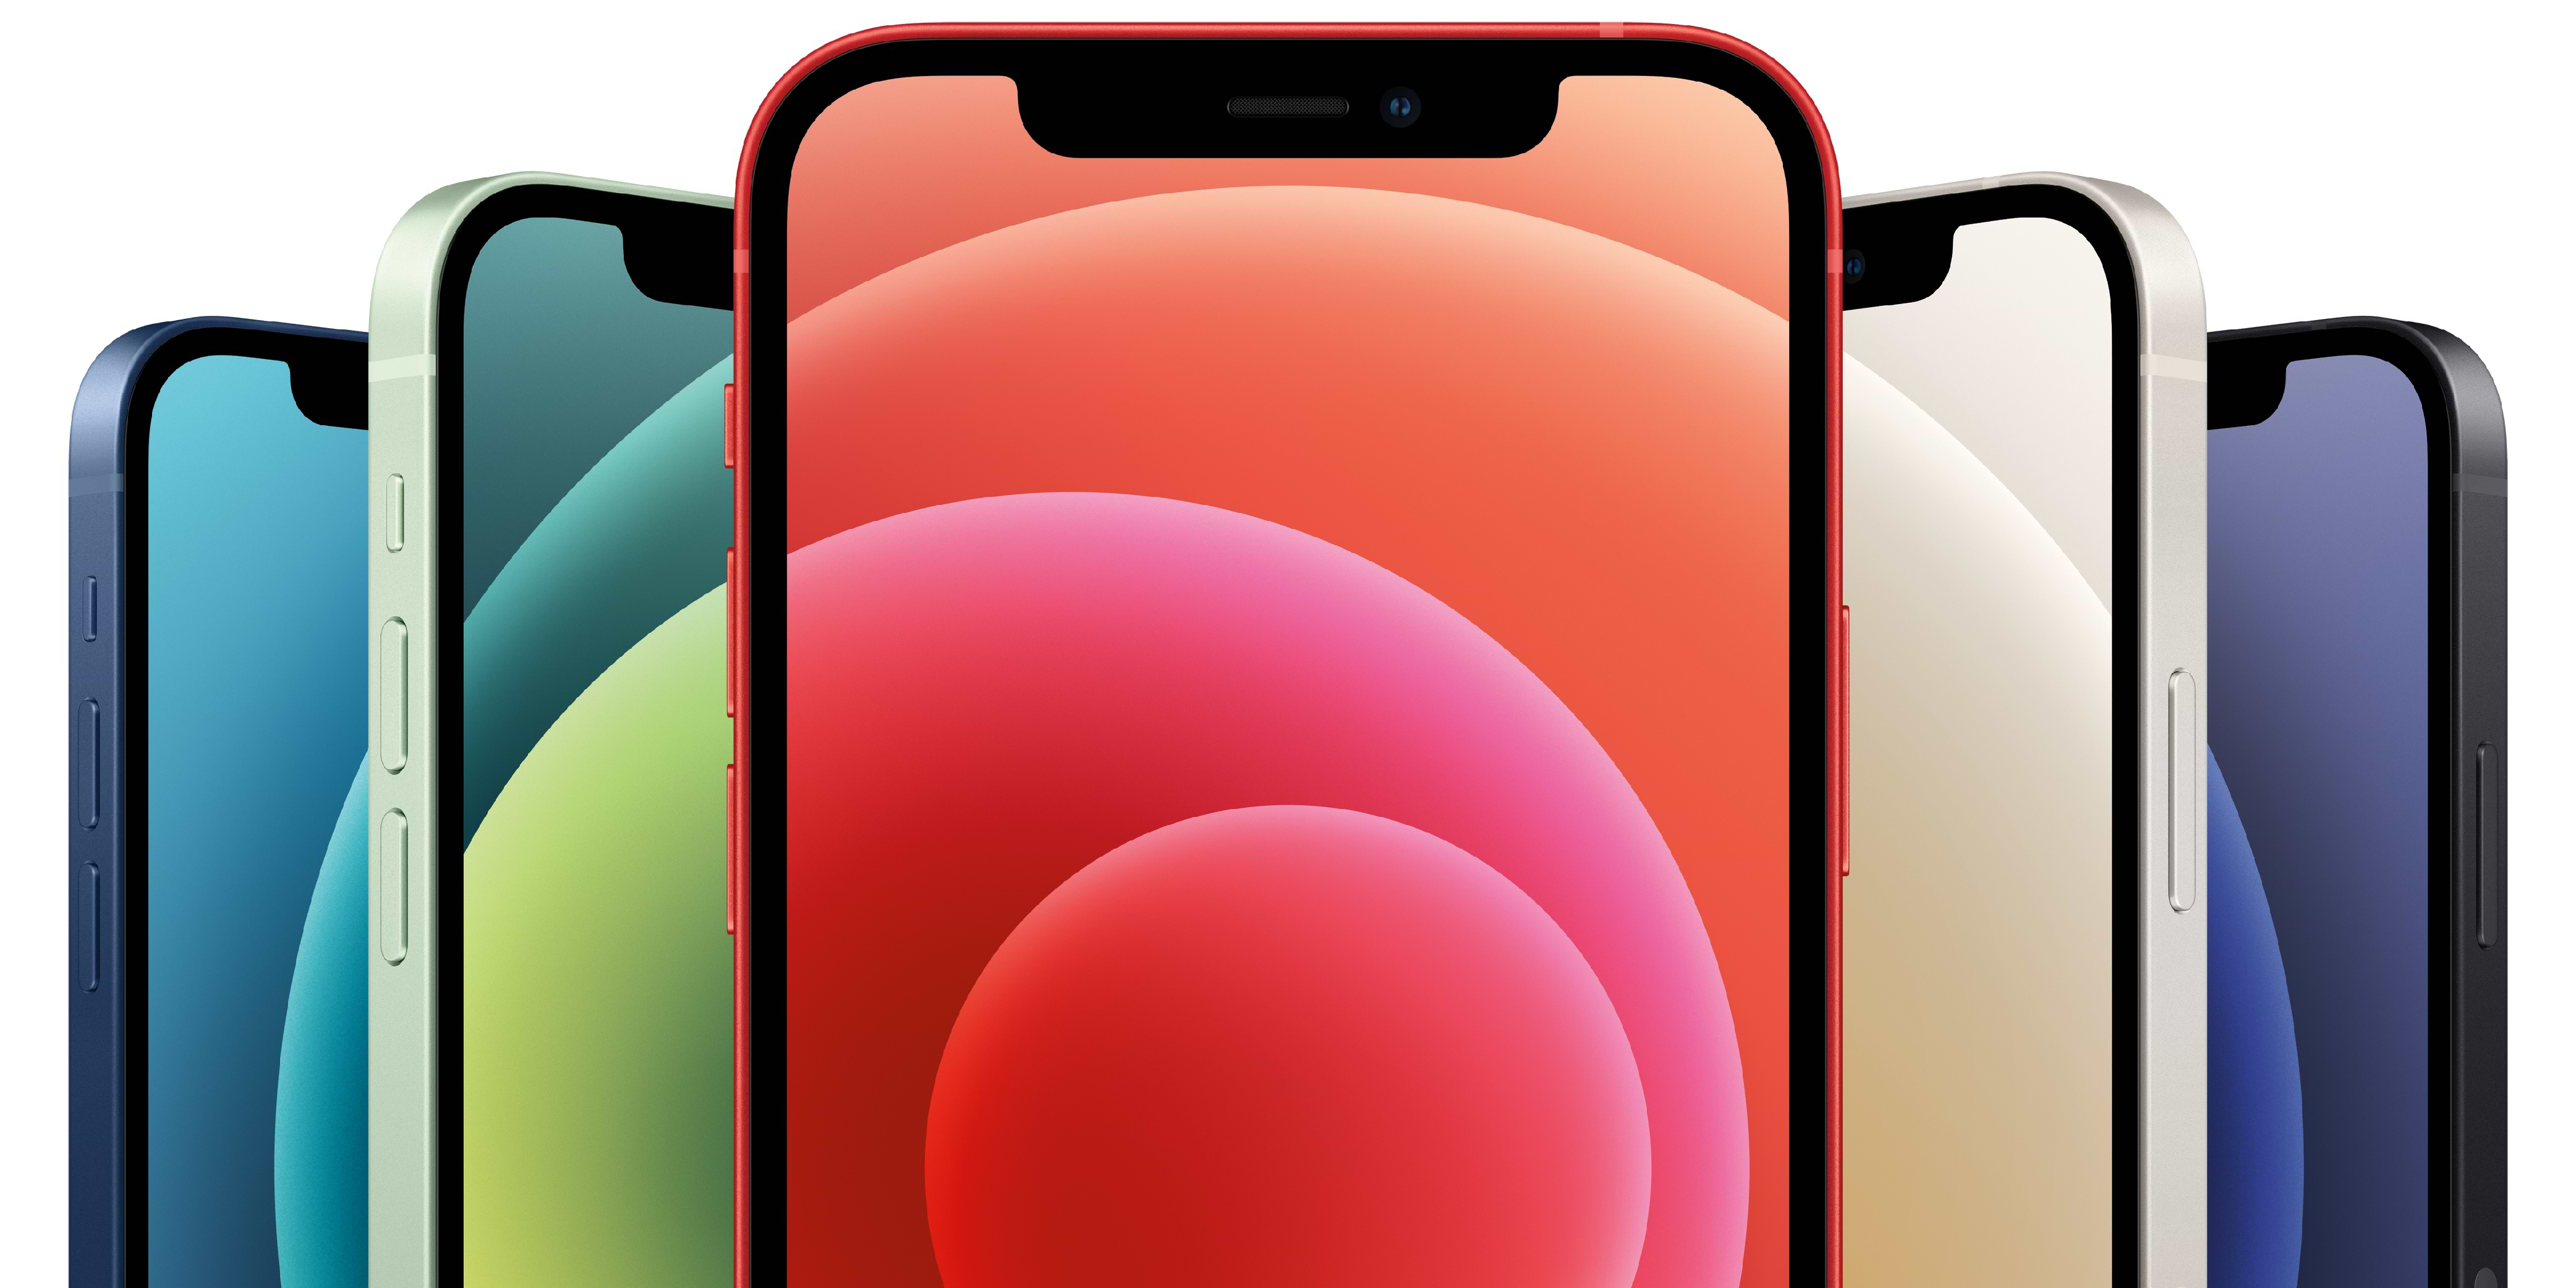 iPhone 12 ו-iPhone 12 mini: עידן חדש ל-iPhone עם תמיכה ב-5G